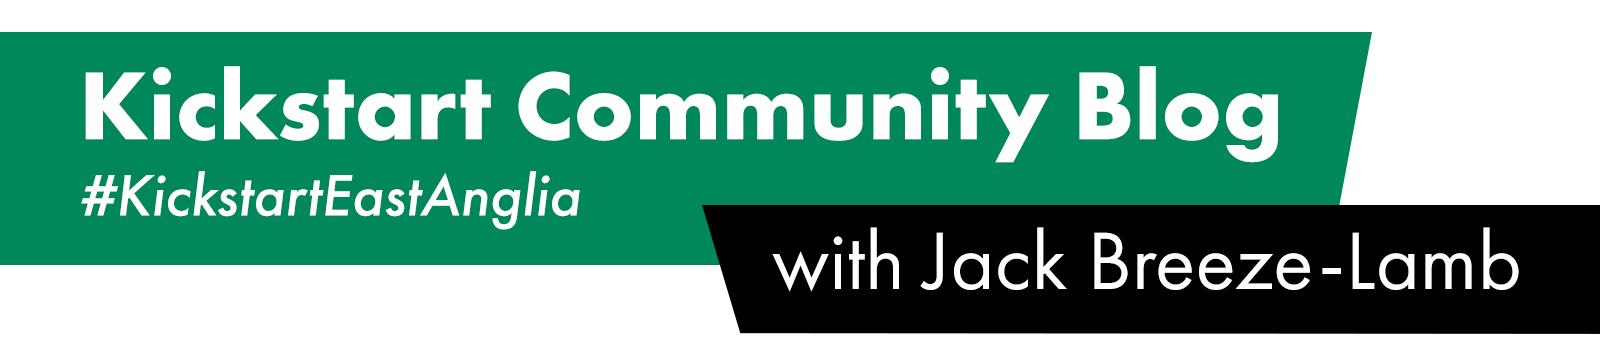 Kickstart-community-blog-banner1